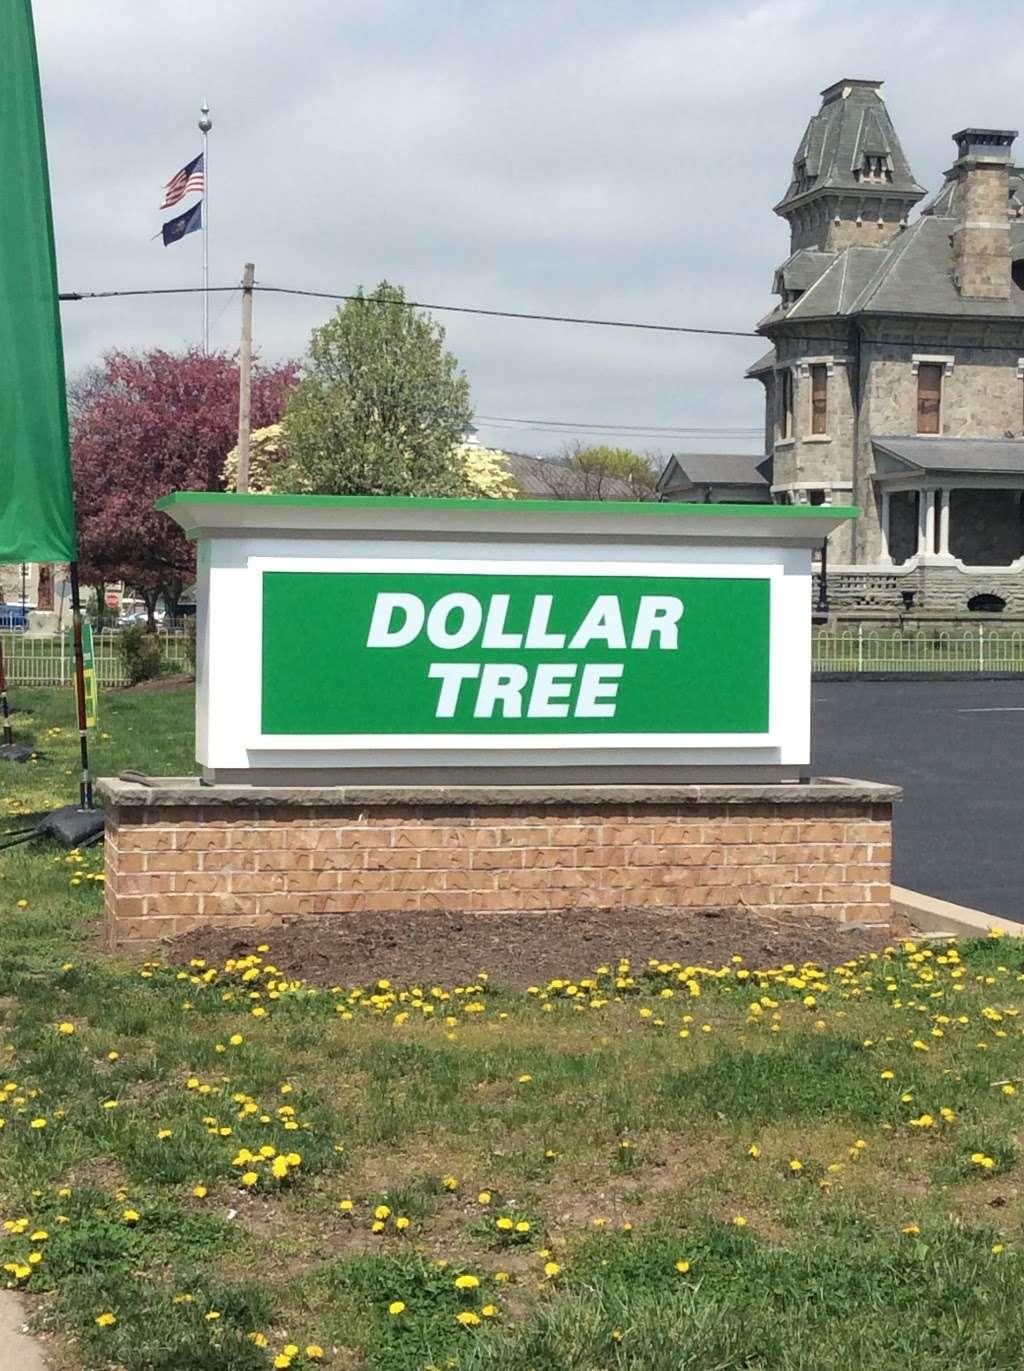 Dollar Tree - furniture store  | Photo 5 of 10 | Address: 326 N Market St, Berwick, PA 18603, USA | Phone: (570) 752-3023